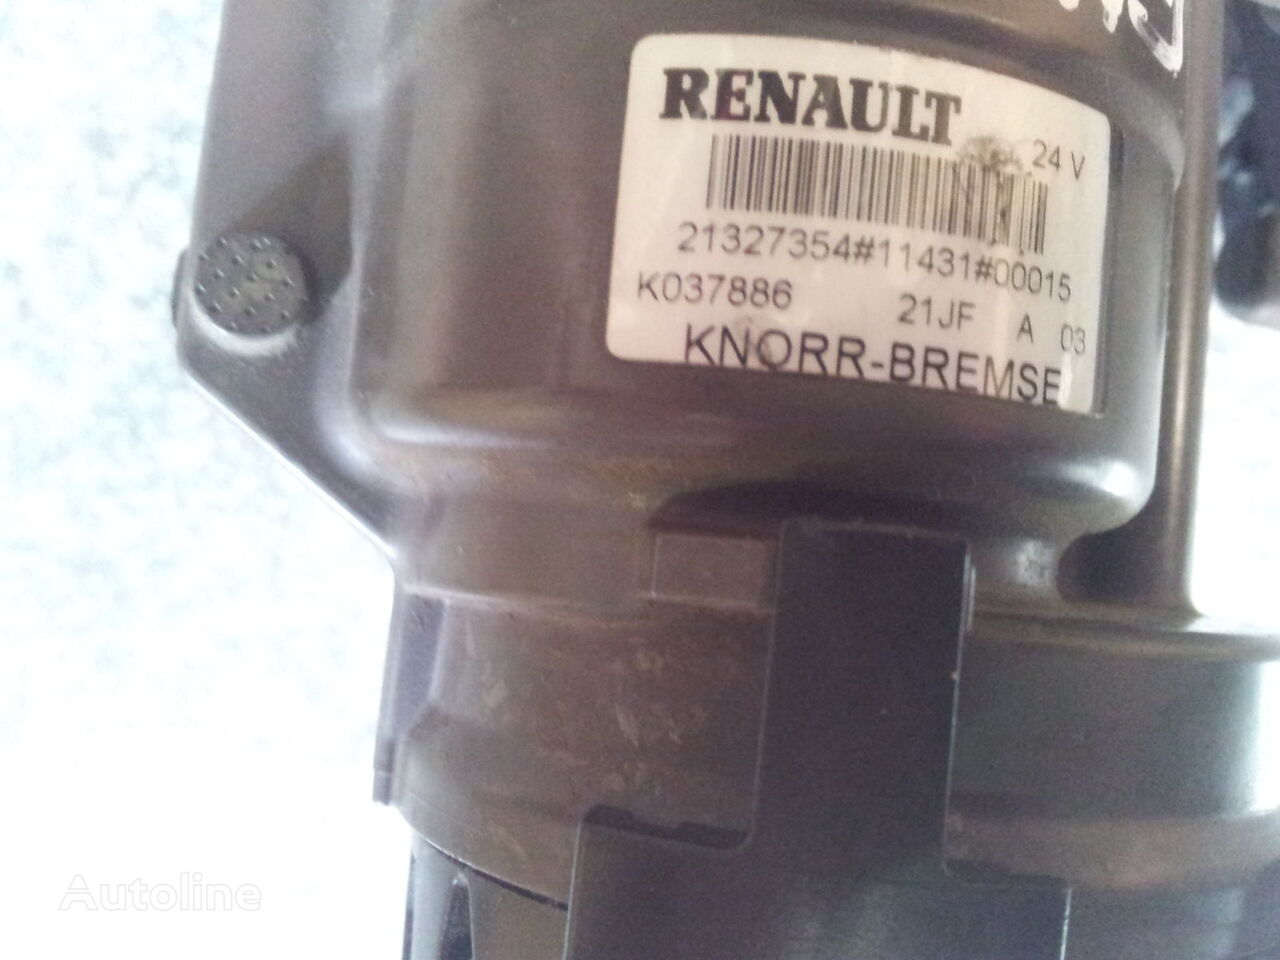 кран RENAULT VOLVO FH4, Range, , EURO6, EBS modulator, 7421327354, 211149 для тягача RENAULT Gama